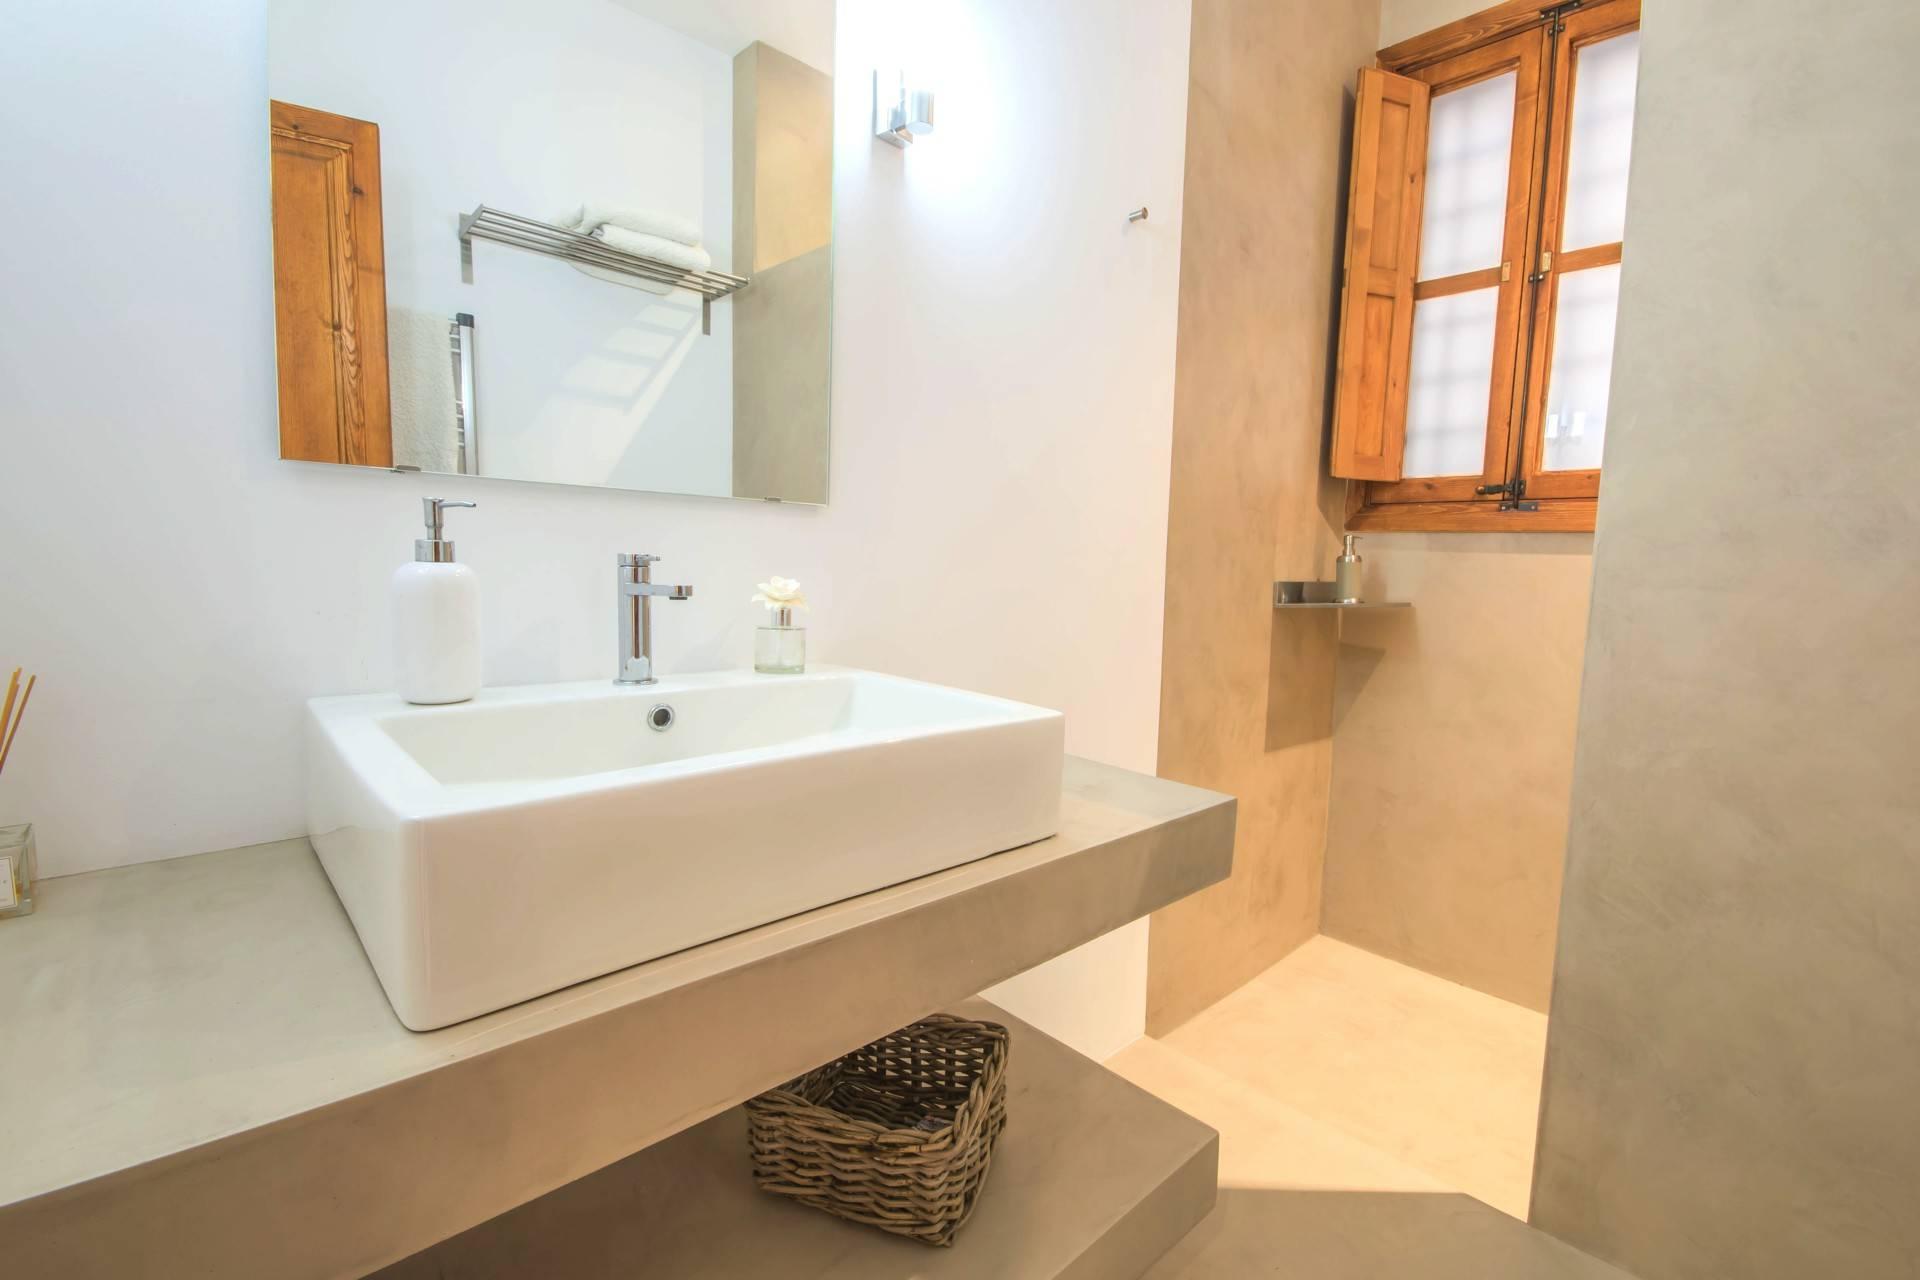 01-257 Luxus Ferienhaus Mallorca Südwesten Bild 29